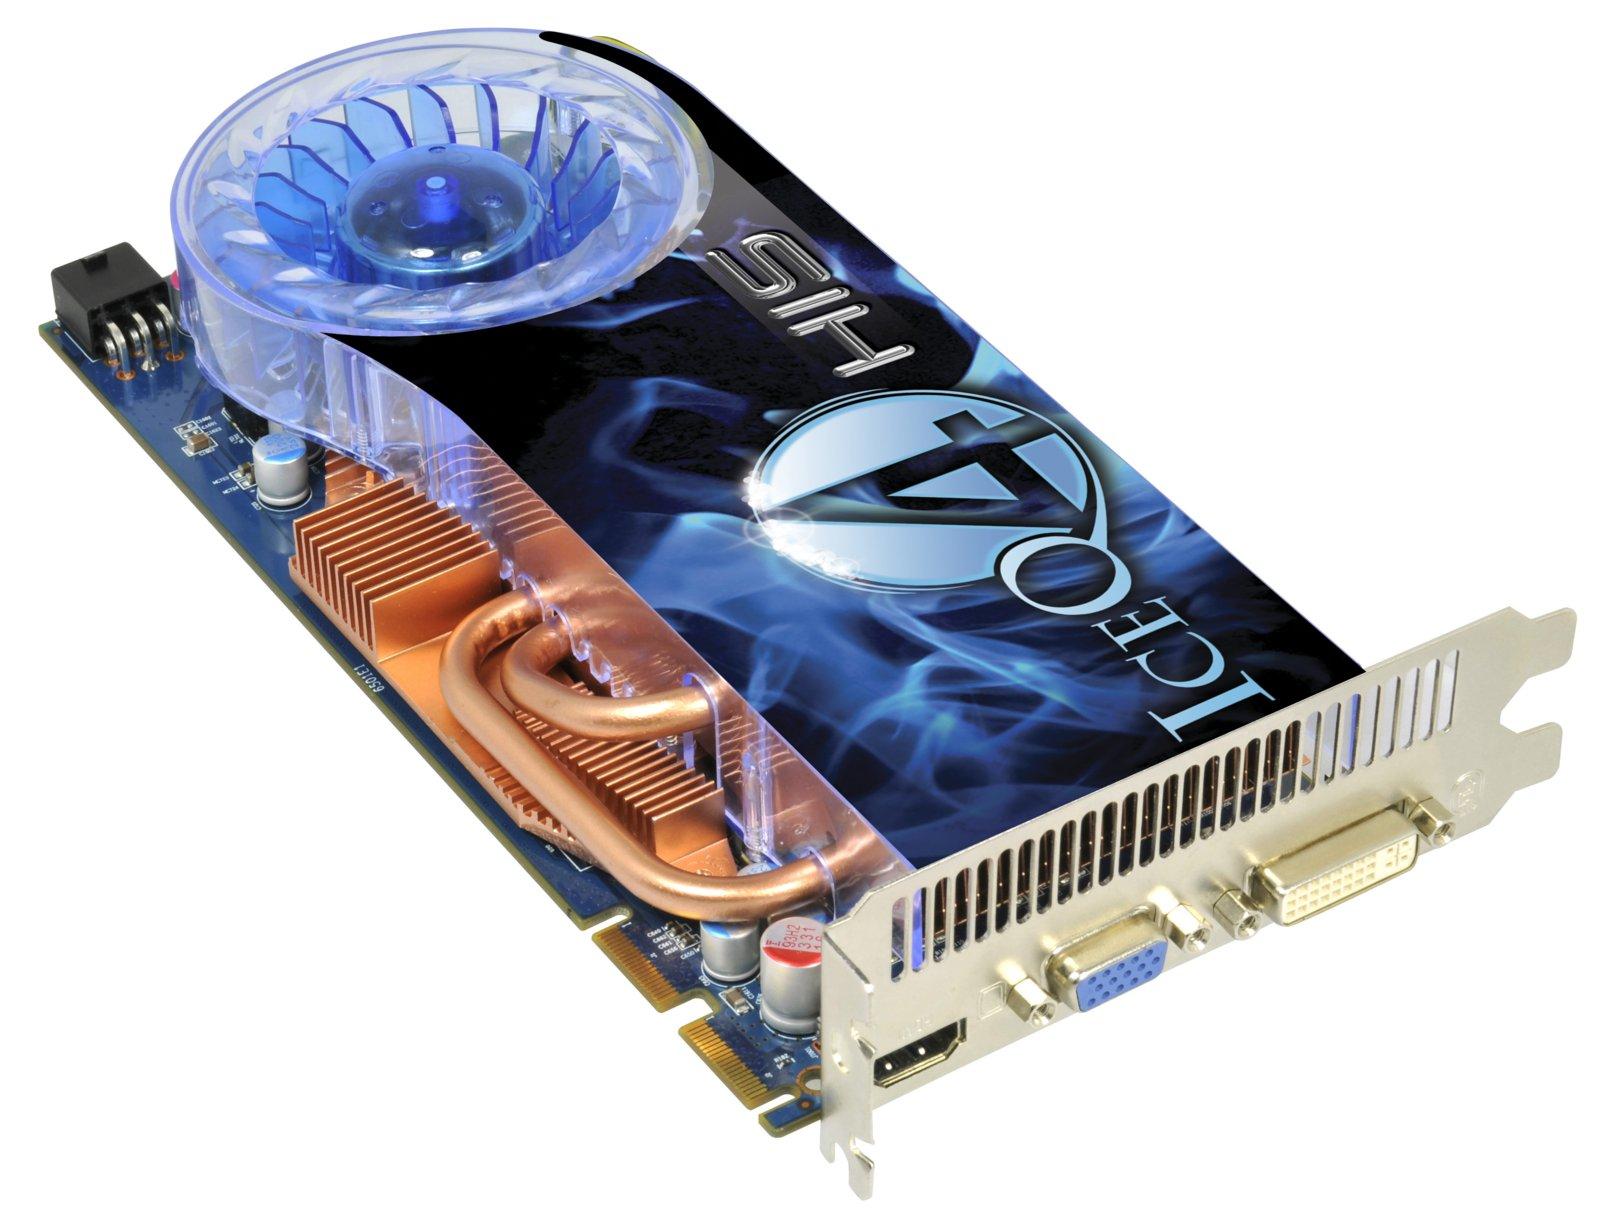 HIS HD 4850 IceQ 4 Native HDMI 1GB256bit GDDR3 PCIe Legacy Products Desktop Graphics